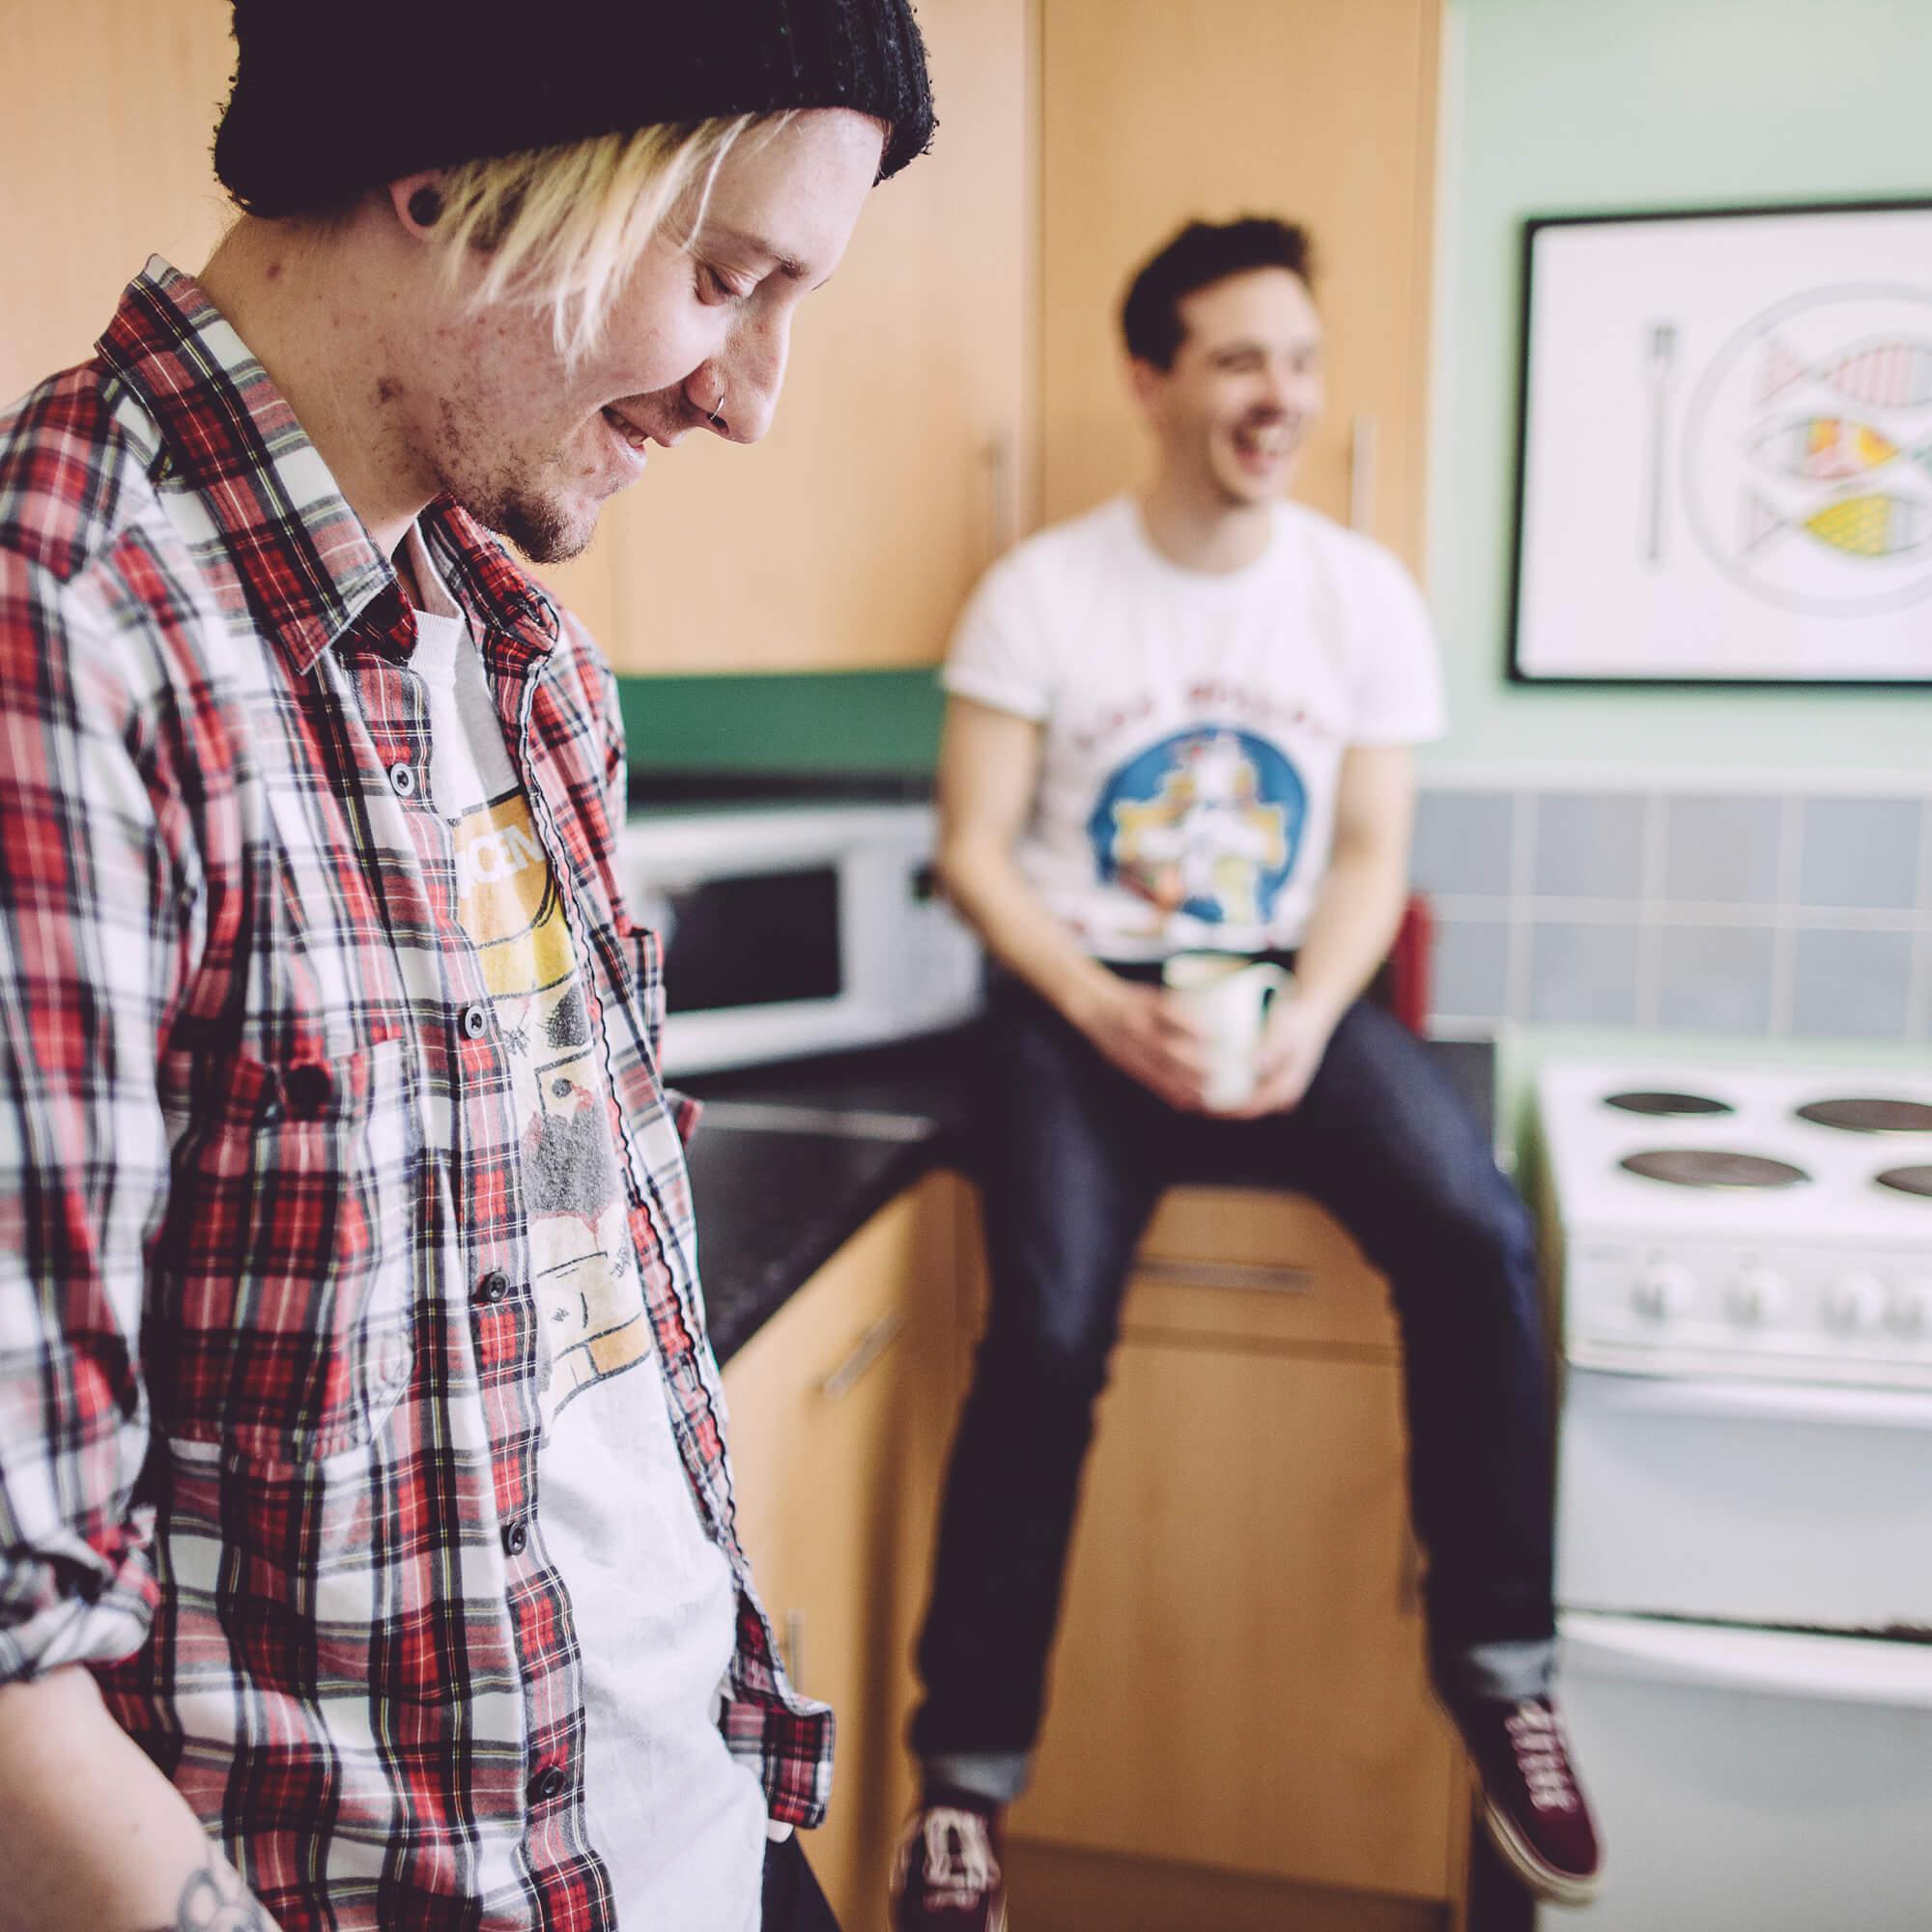 Two boys in halls kitchen, one sitting on worktop